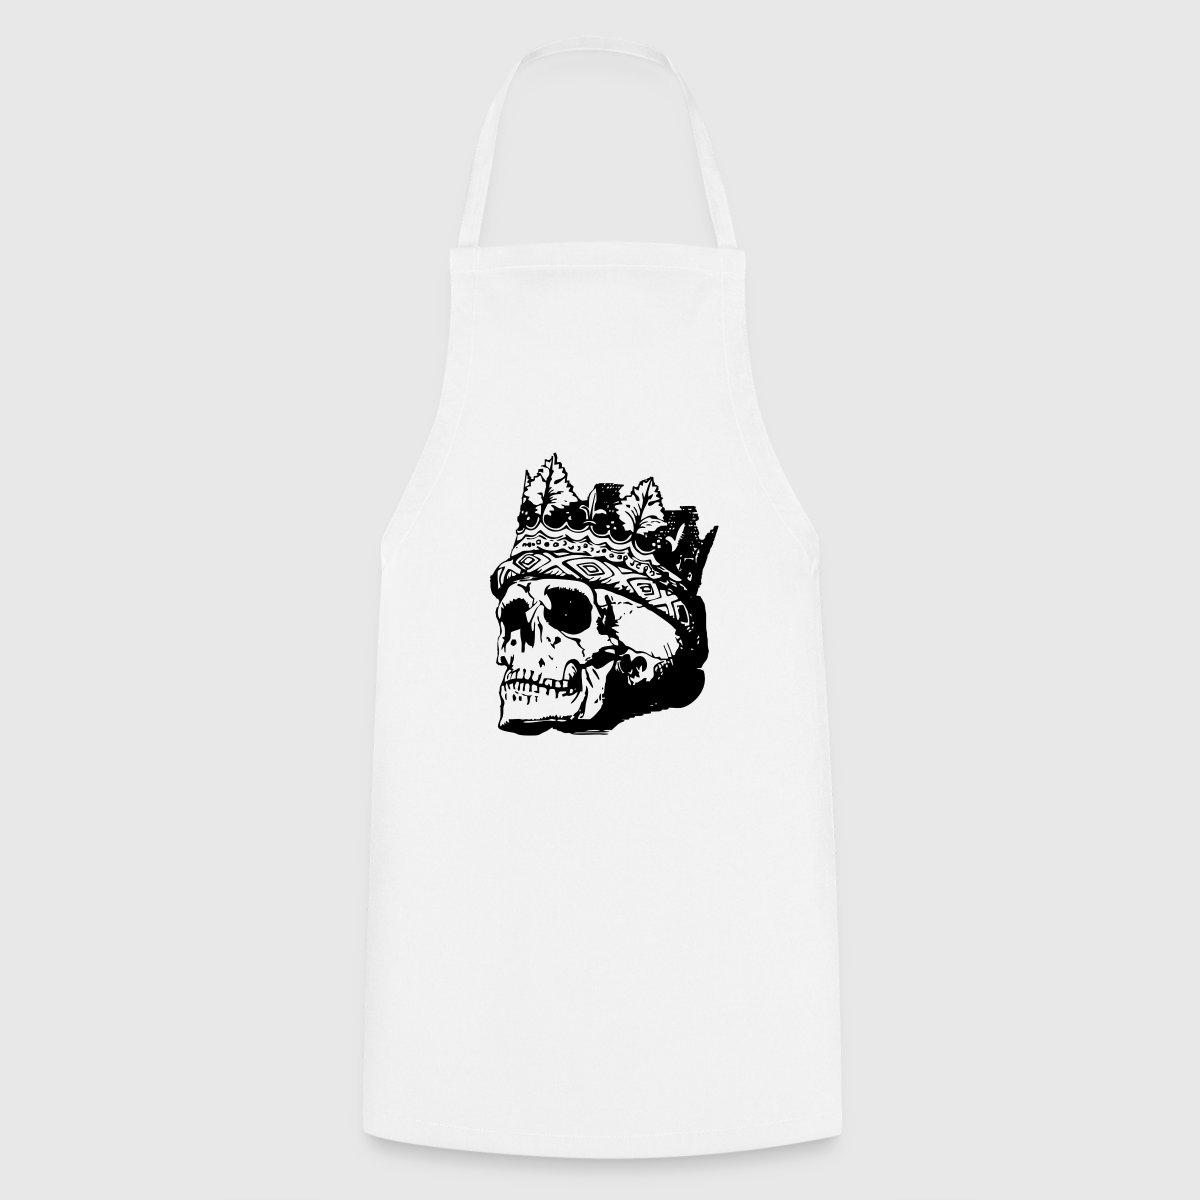 Lujoso Crosley Cocina Cesta Canadá Adorno - Ideas de Decoración de ...